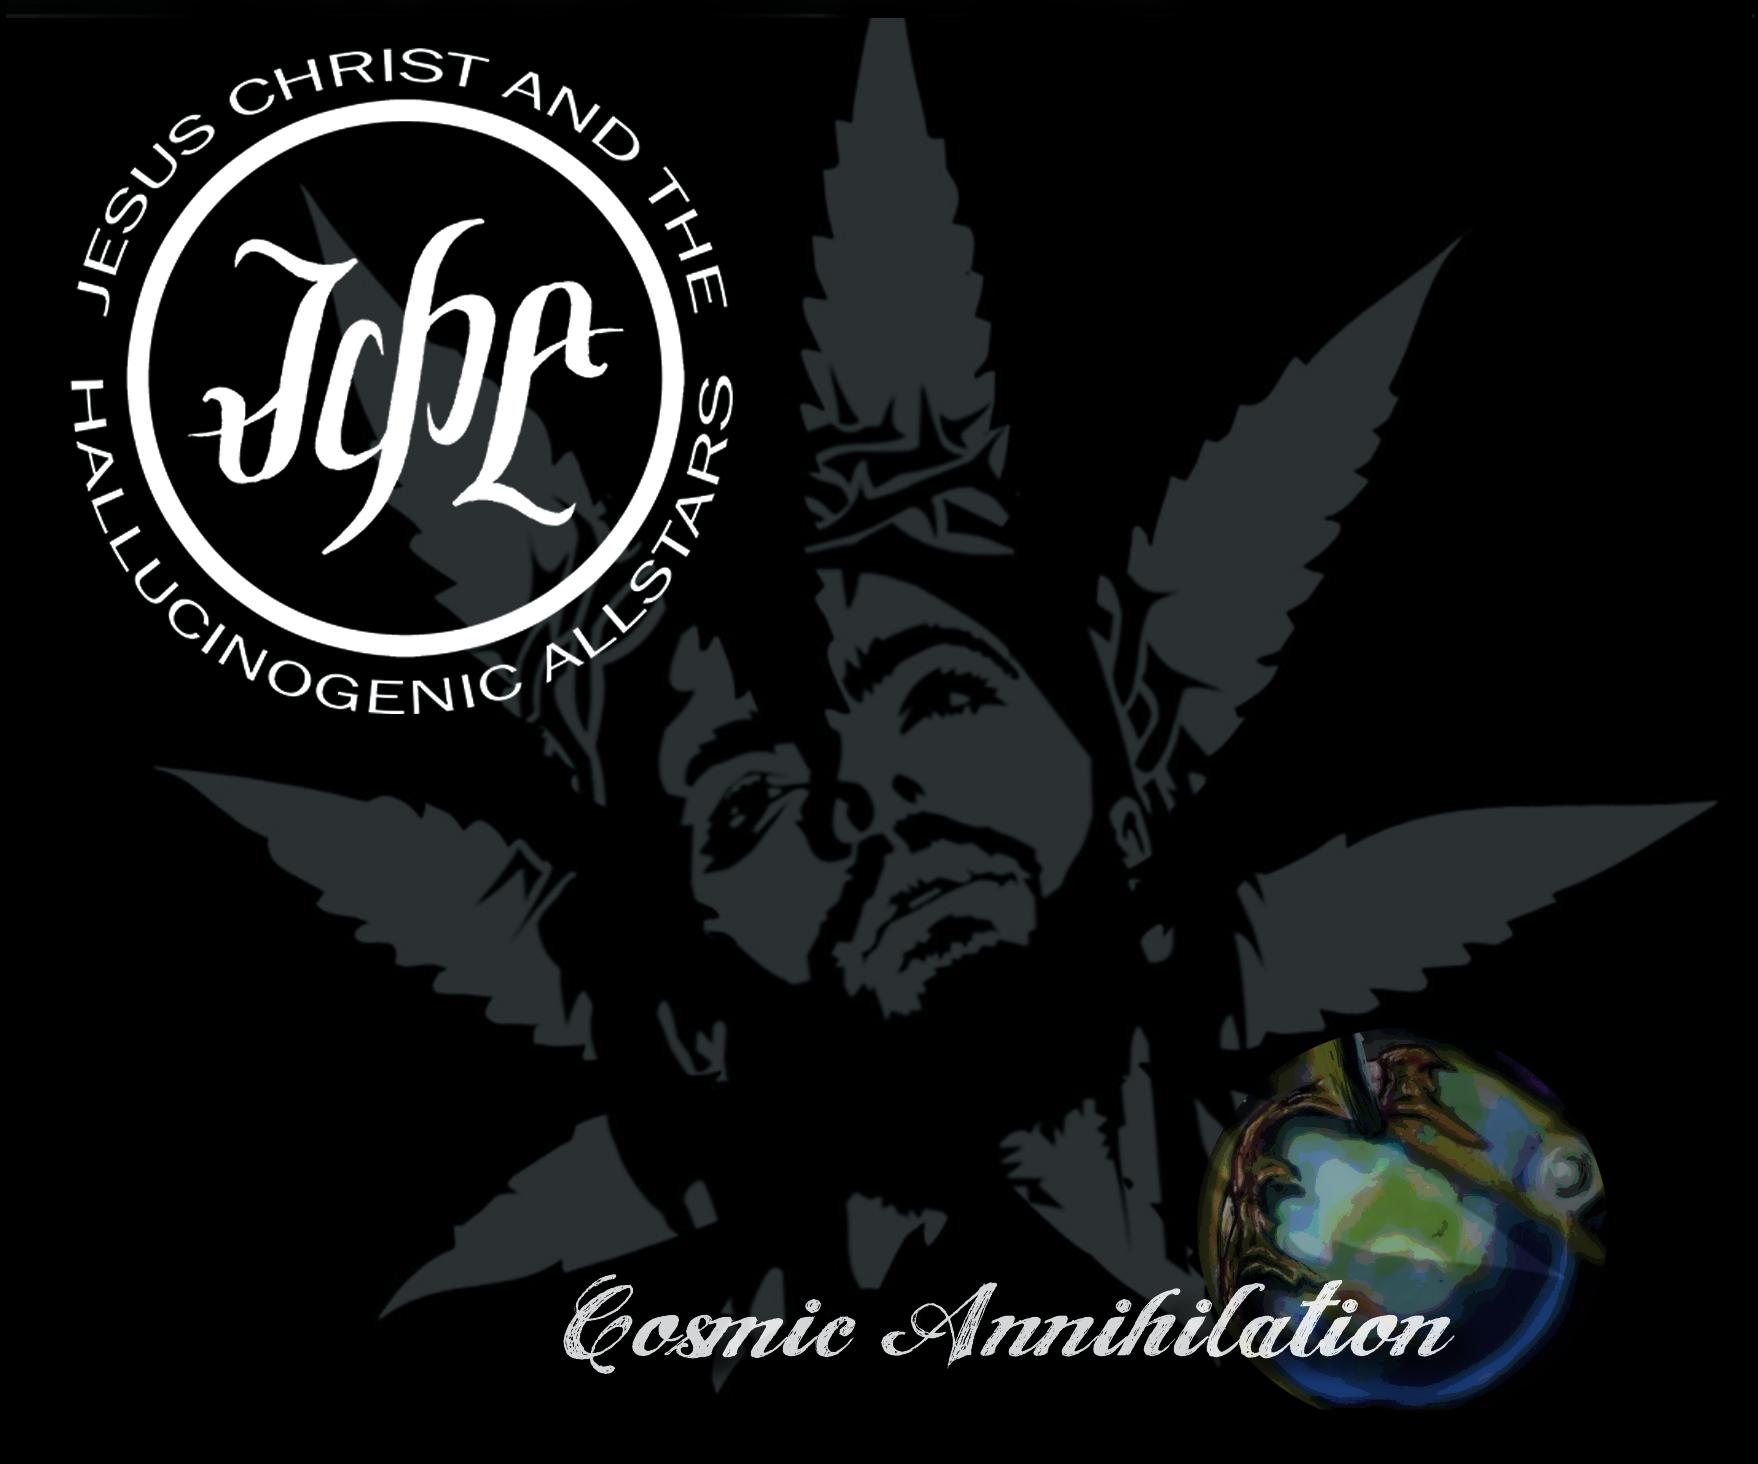 JCHA - Cosmic Annihilation